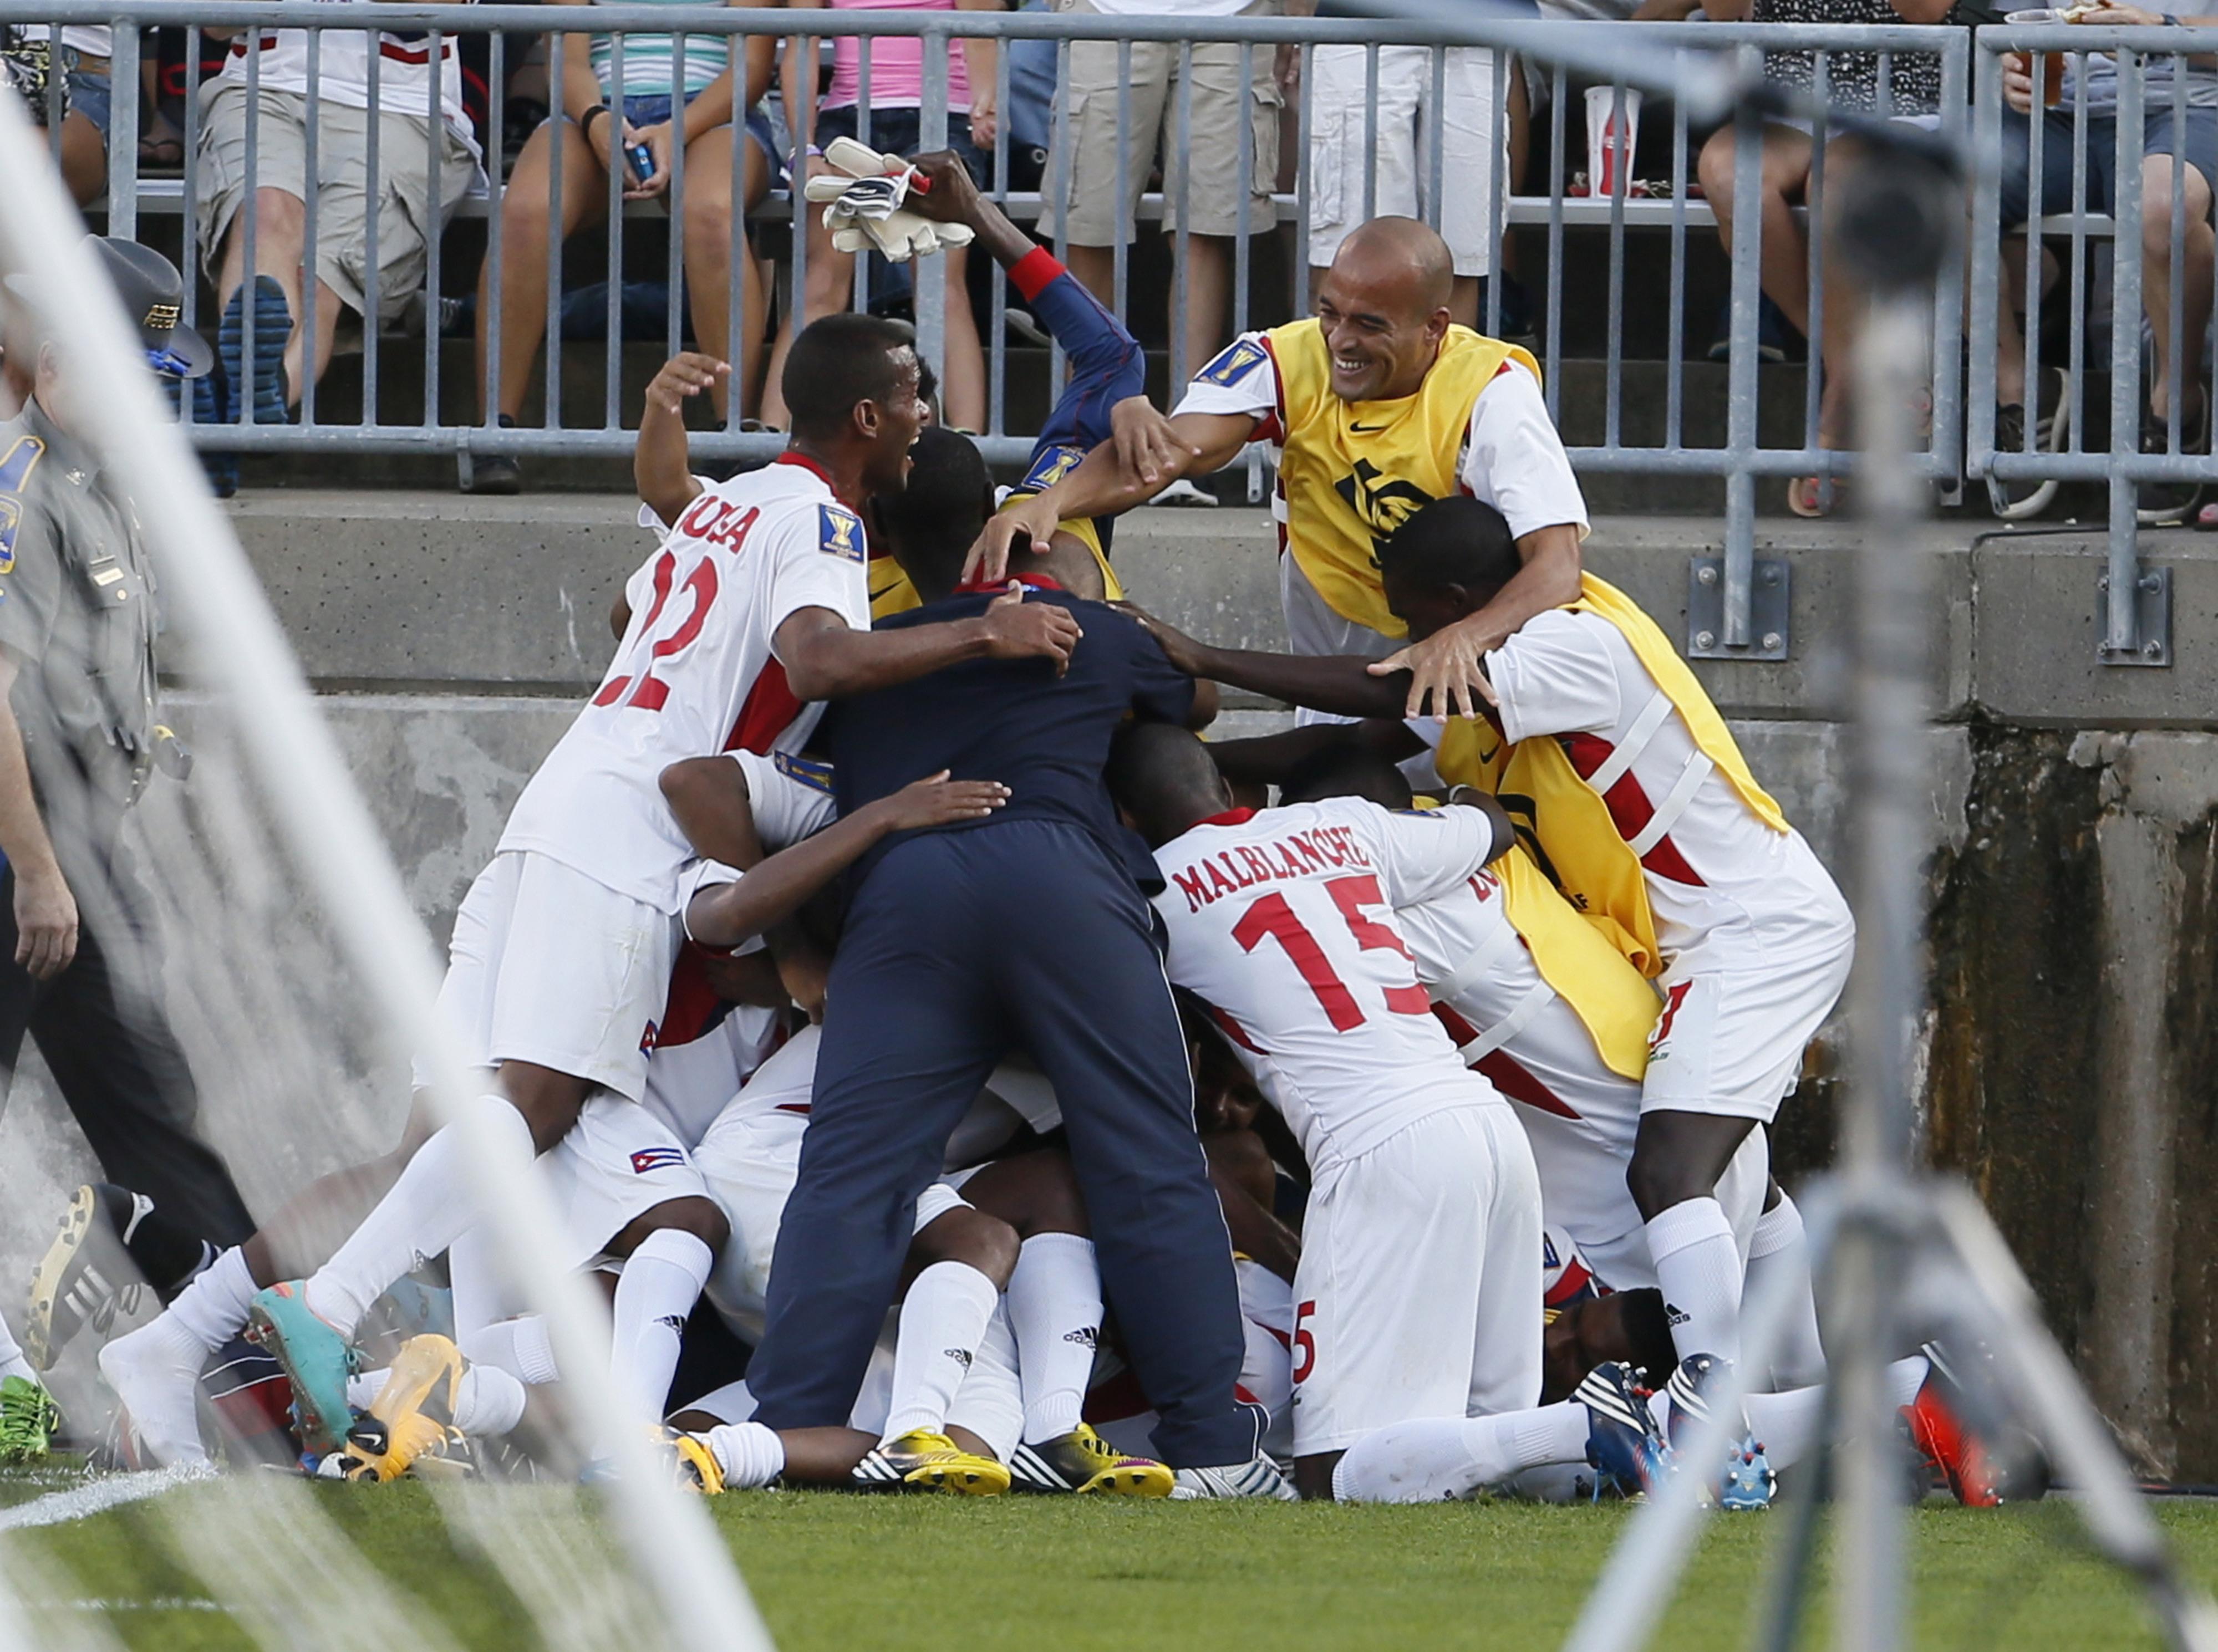 Cuba vs. Belize: Final score 4-0, Lions pull off remarkable win to advance to quarters